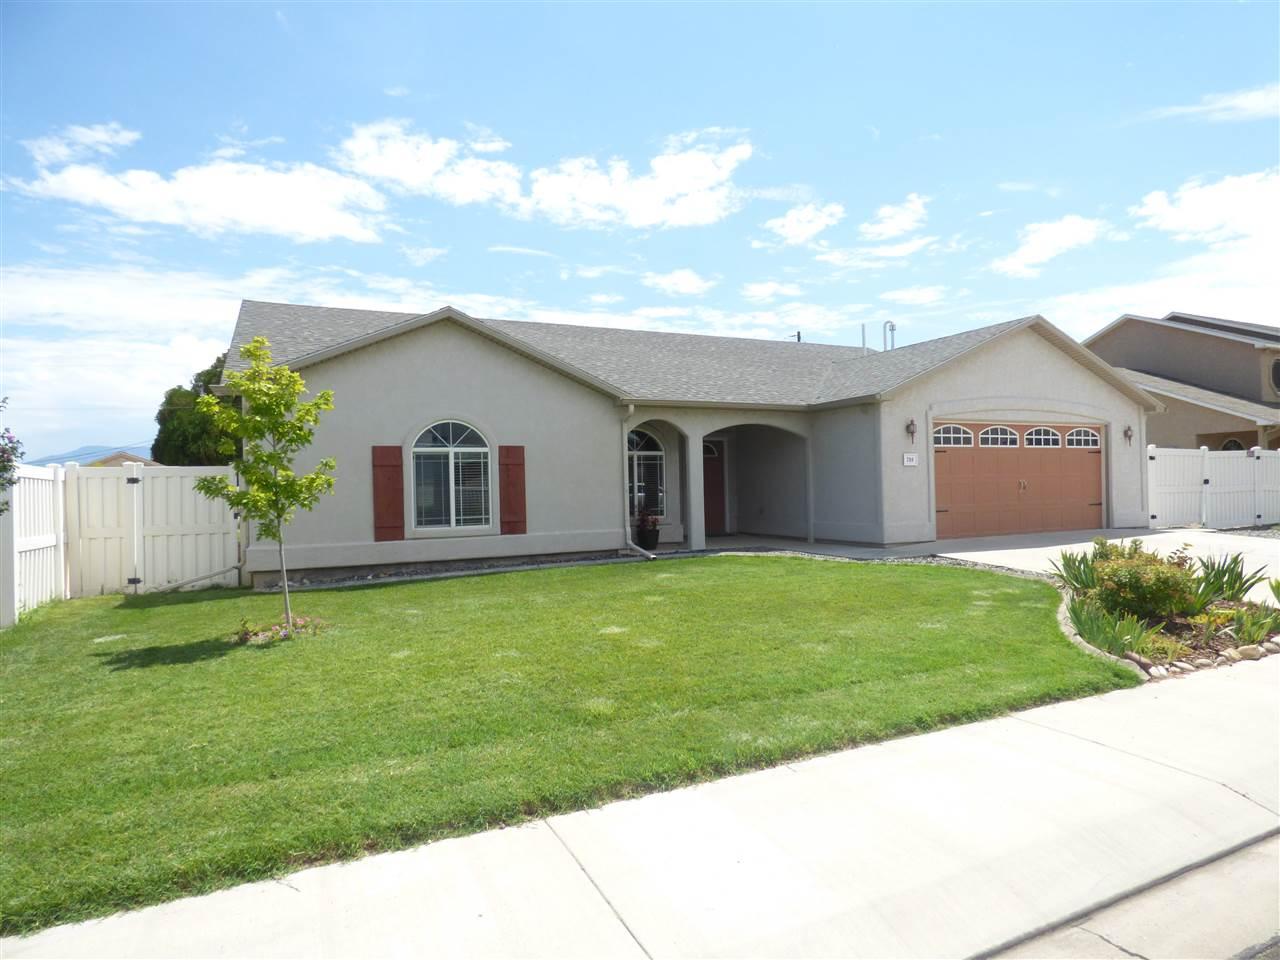 288 Snyder Creek Drive, Grand Junction, CO 81503